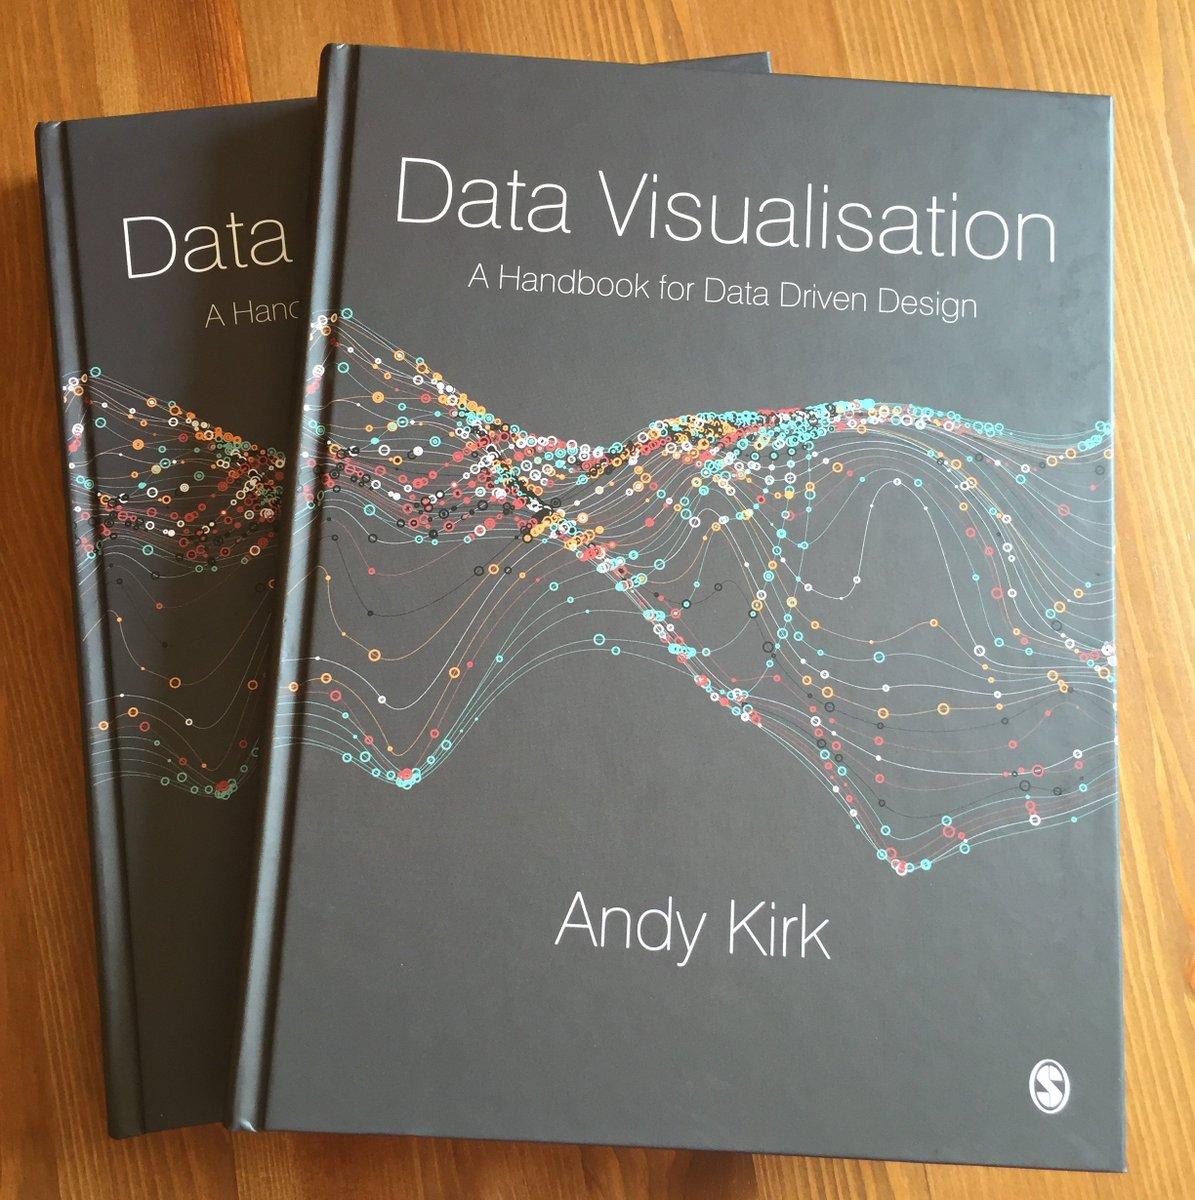 NEW POST: My new book is here! https://t.co/ZBFCzoGGBn https://t.co/BbAfBMmDwq